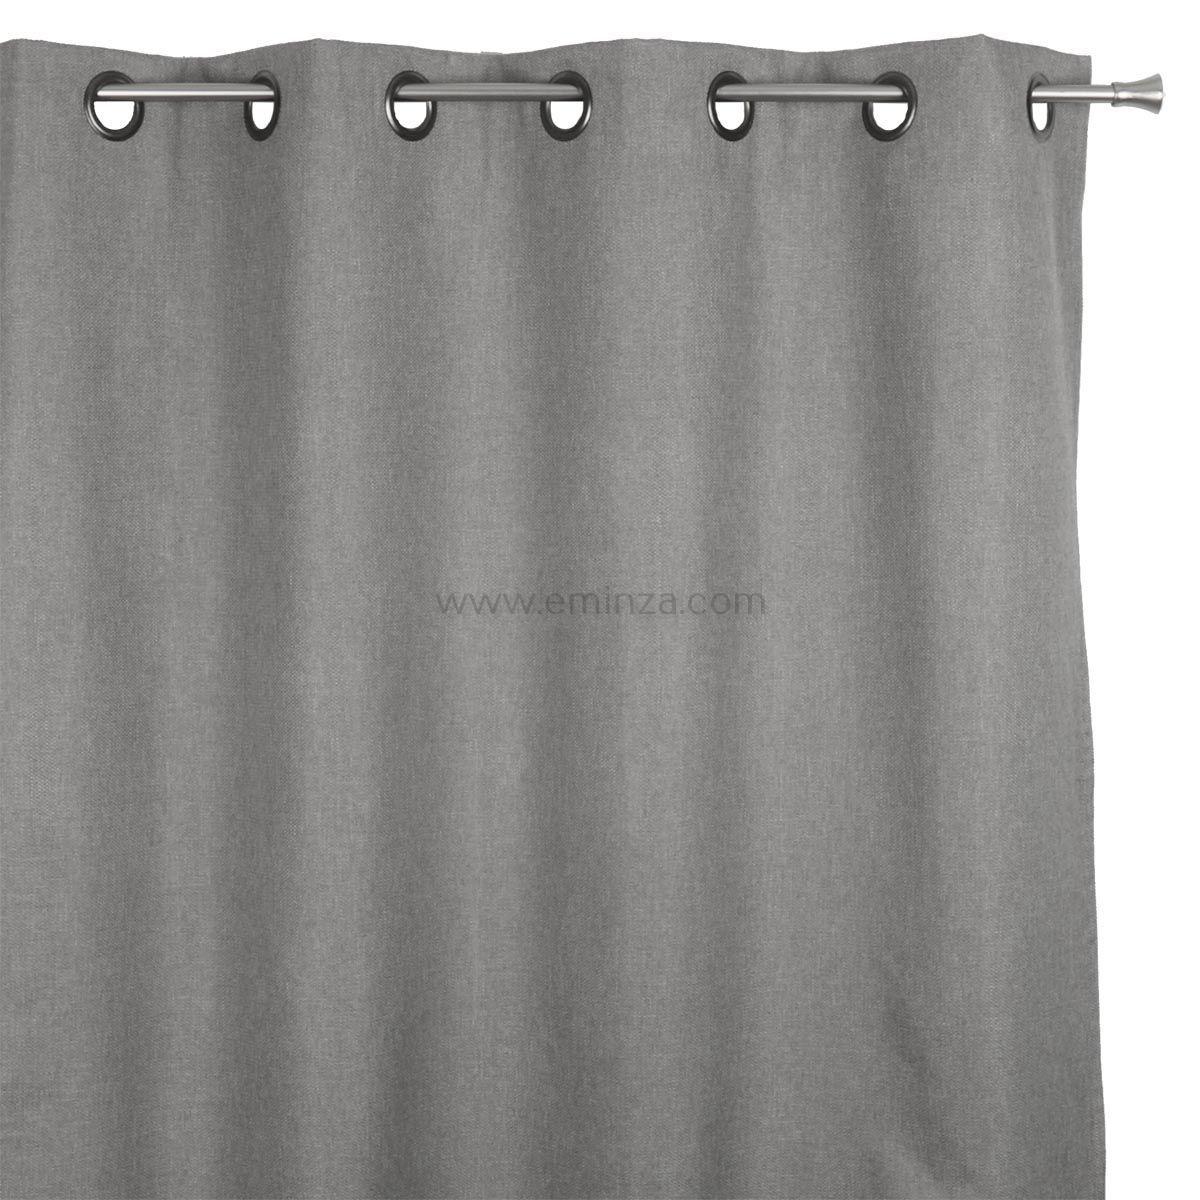 rideau occultant 140 x h240 cm calypso gris rideau occultant eminza. Black Bedroom Furniture Sets. Home Design Ideas